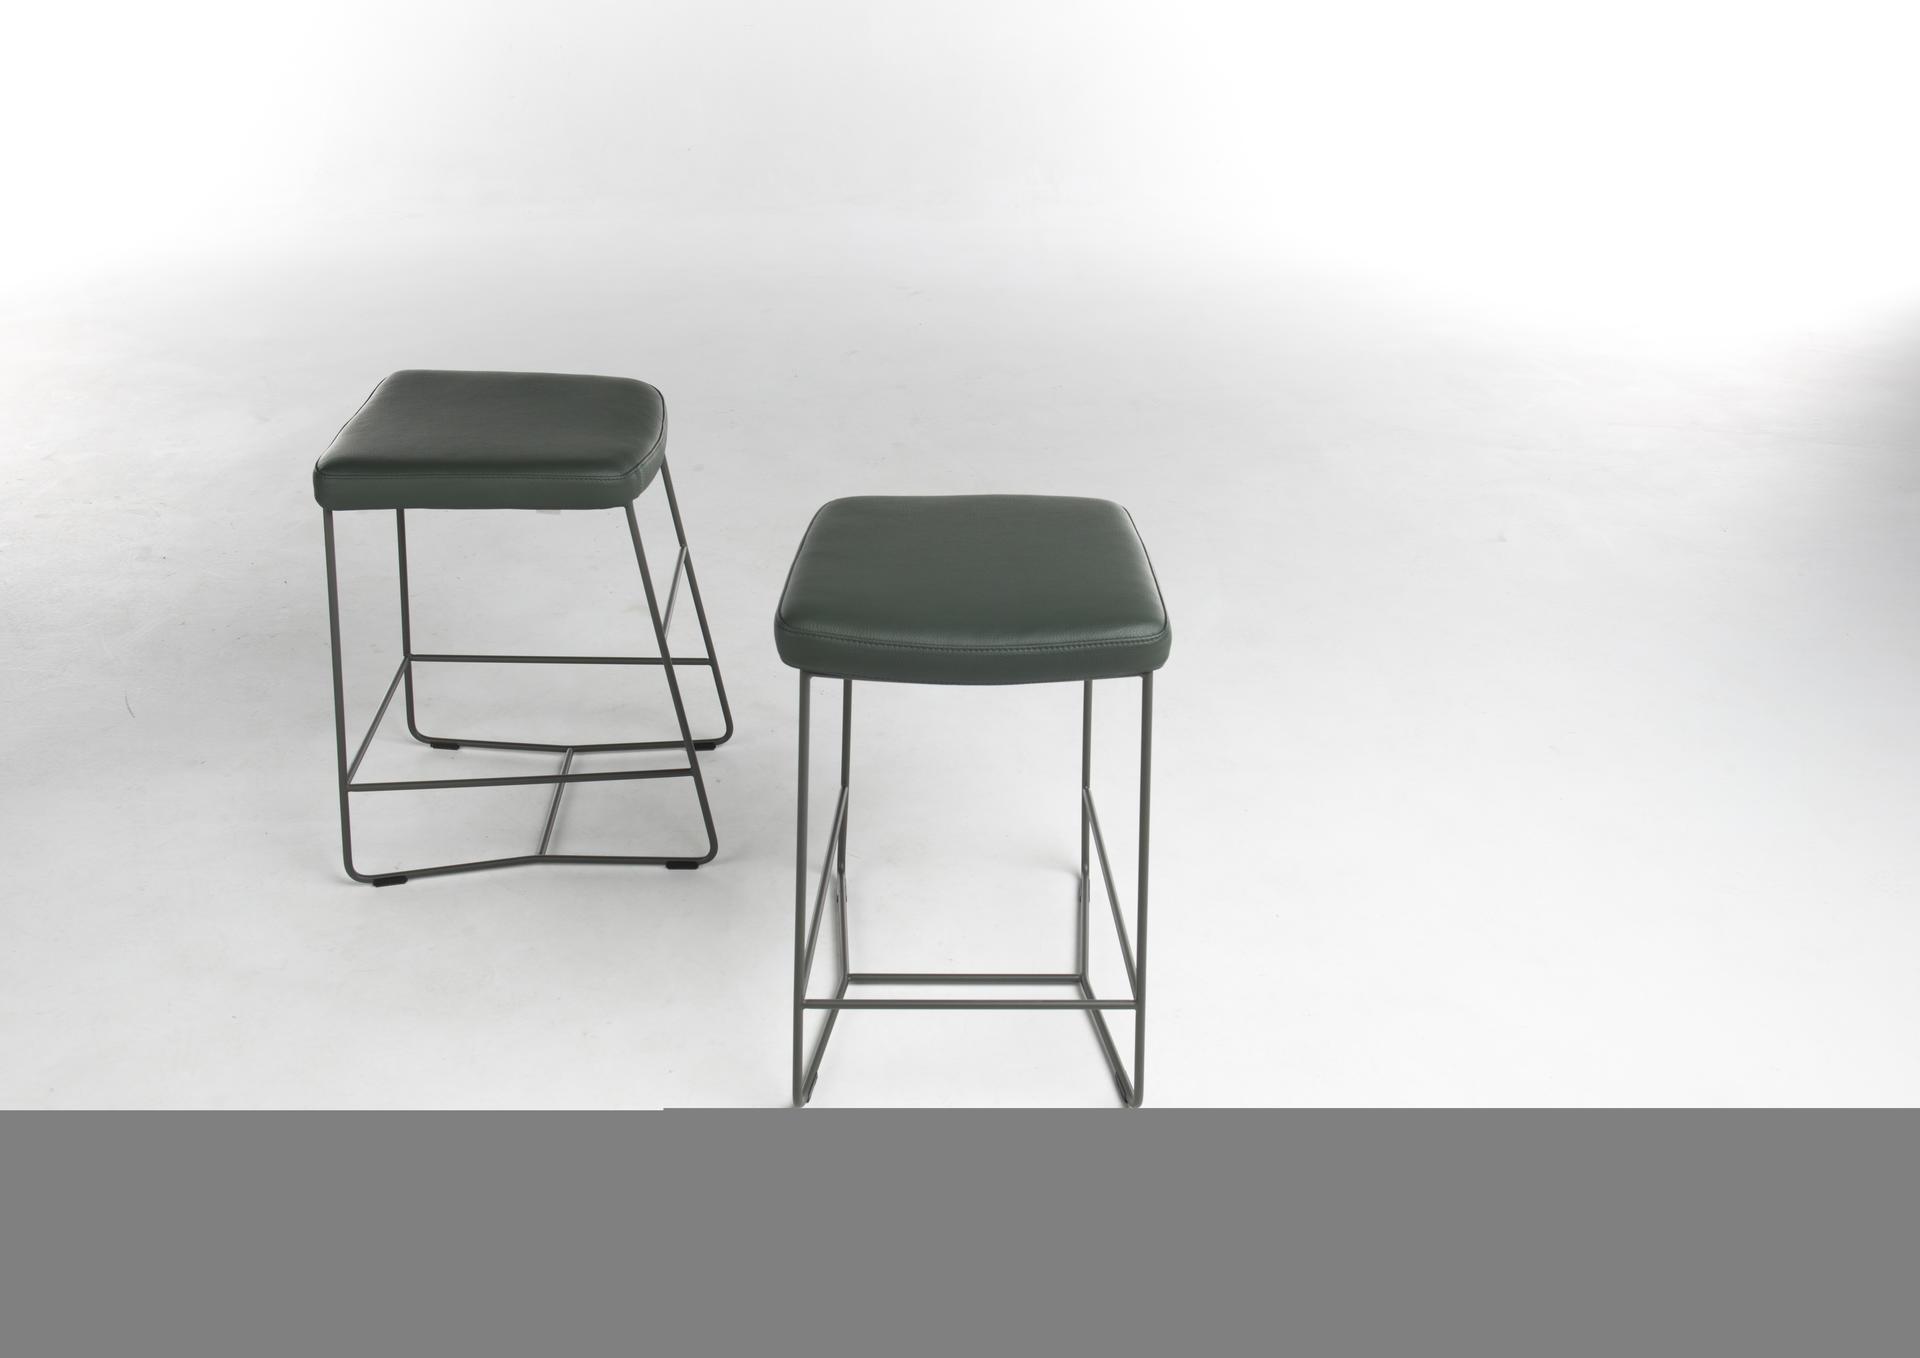 Барный стул стул Kiko, Bert Plantagie, фото 3